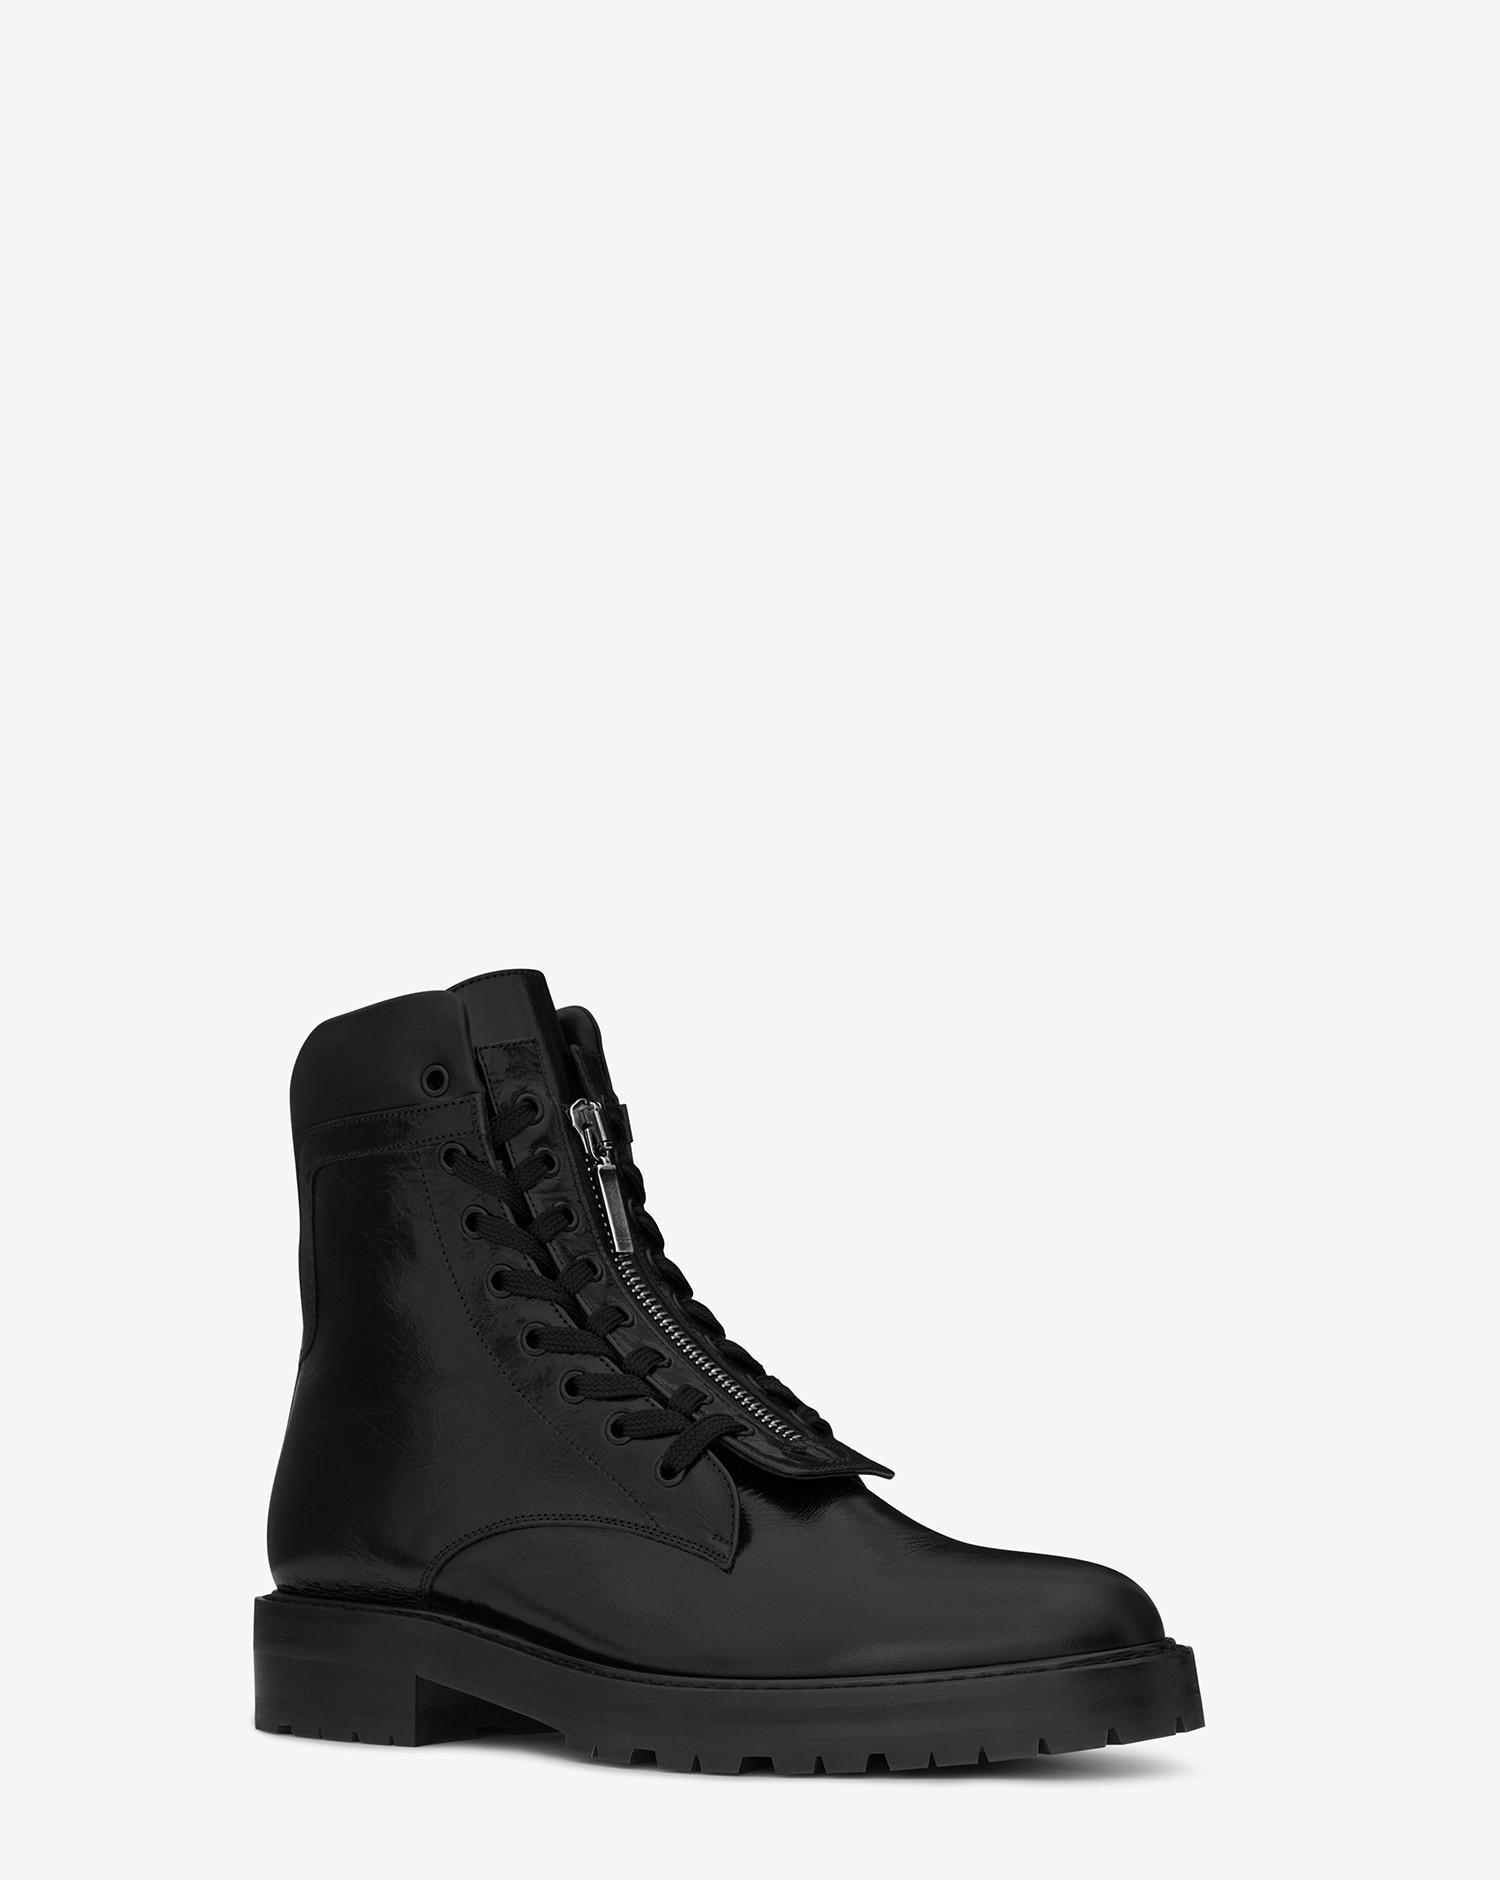 Saint Laurent Boots WILLIAM 20 leather braided